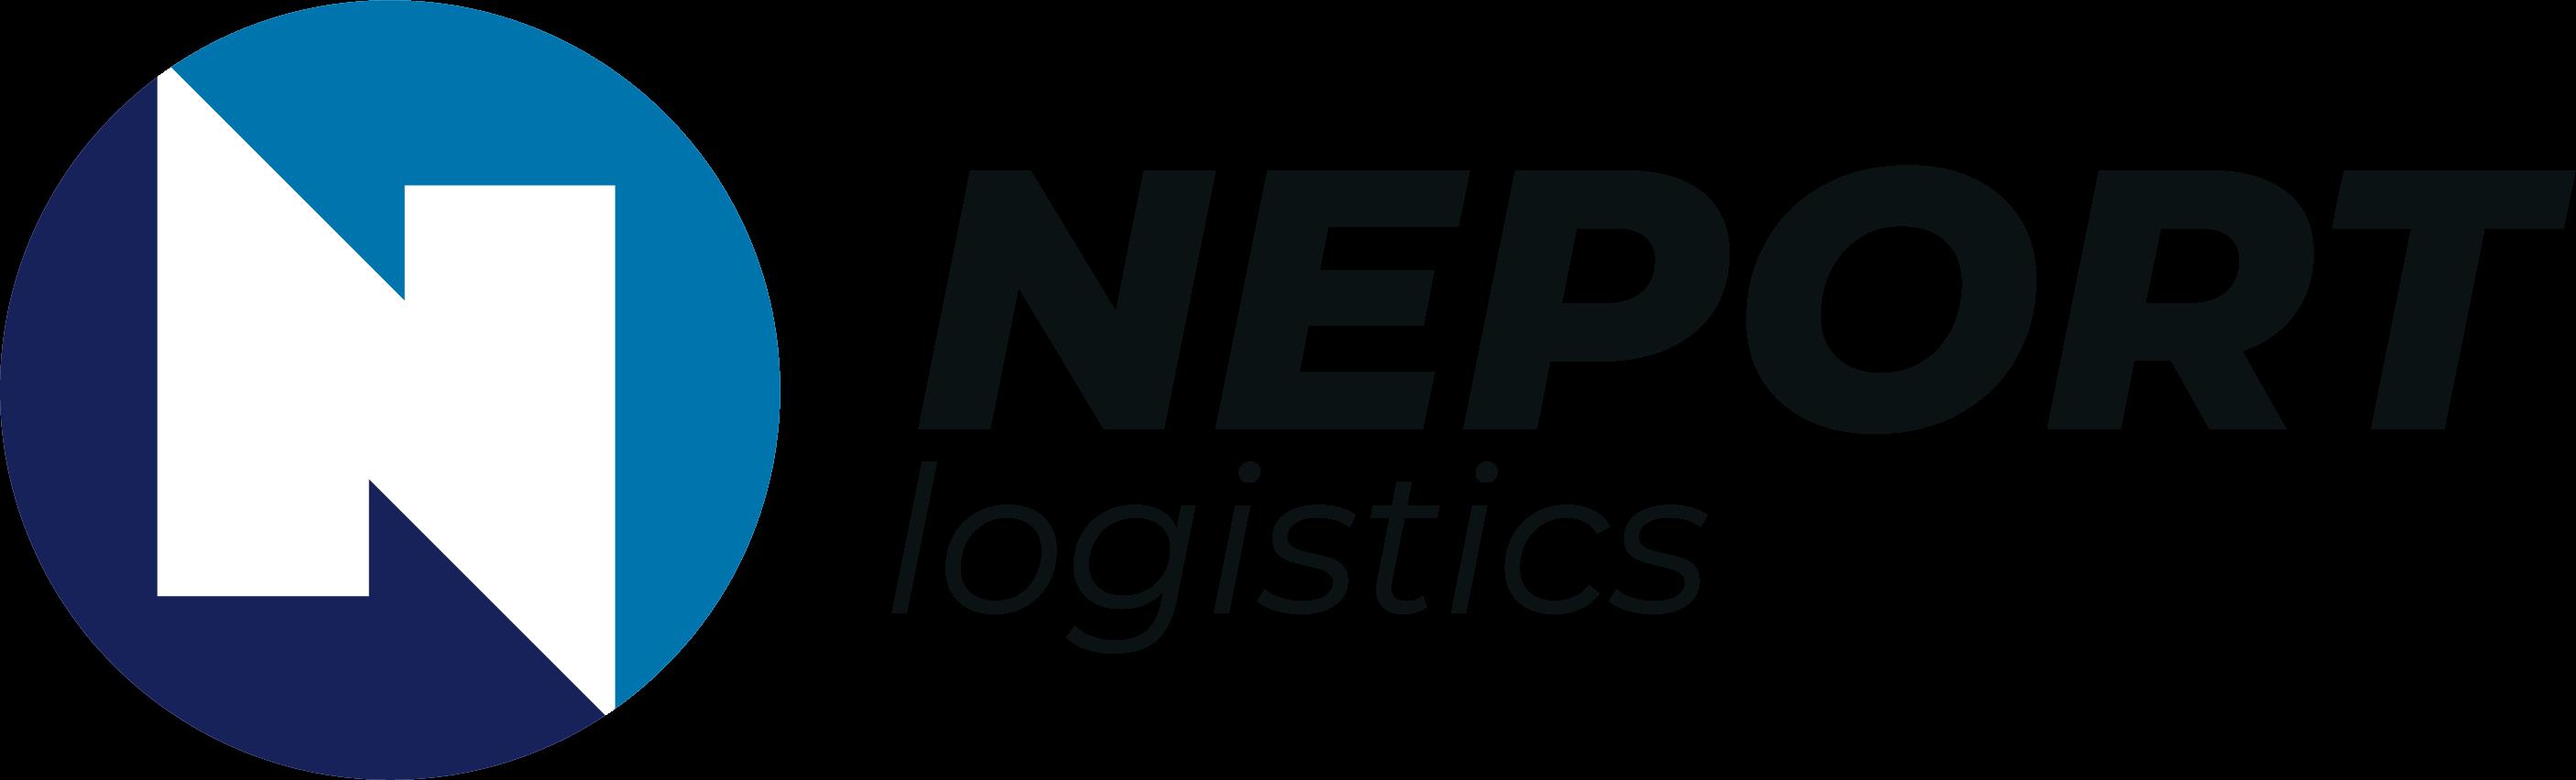 Neport – Logistics GmbH Hamburg